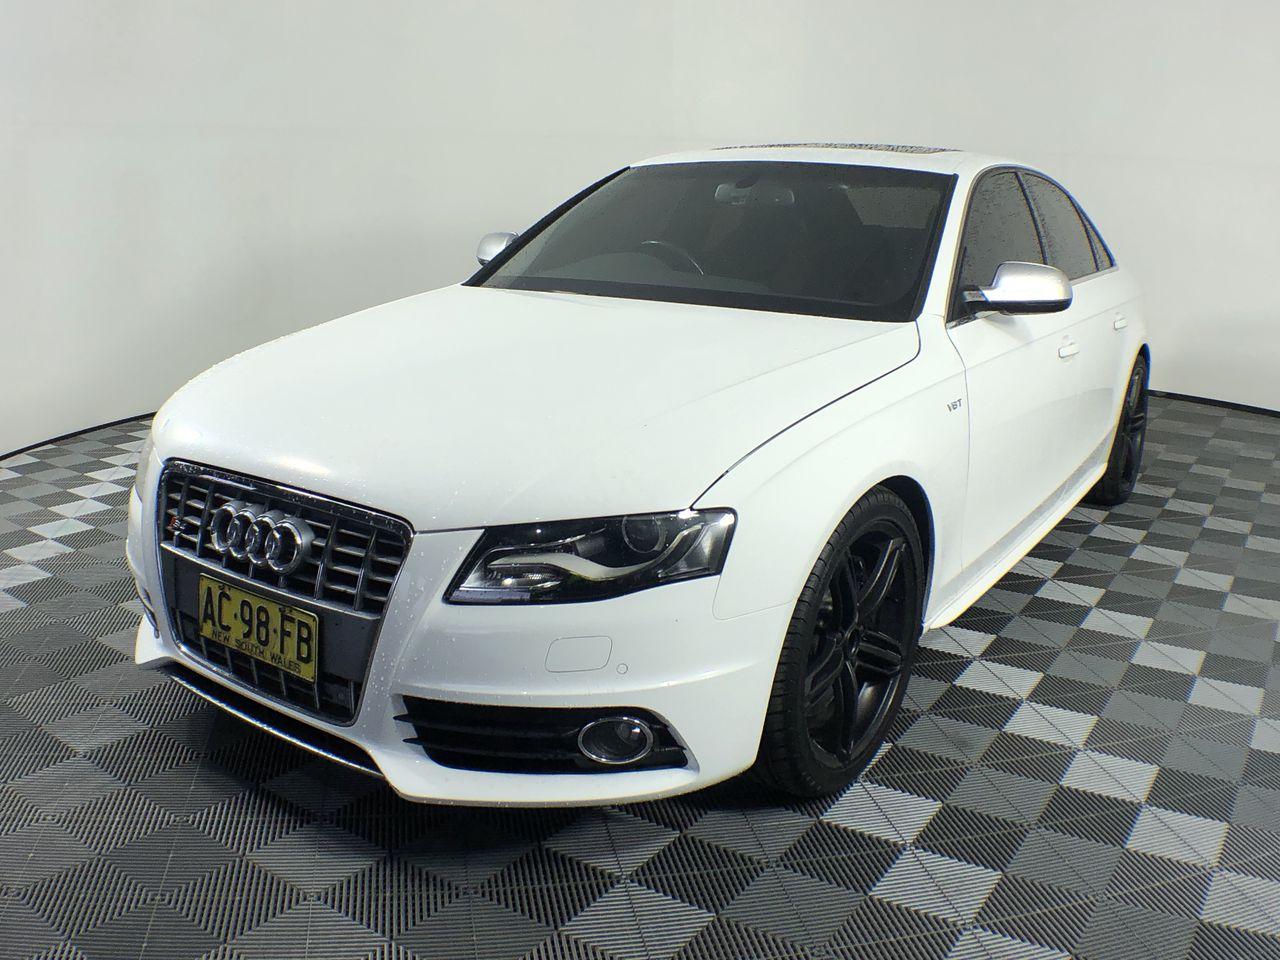 Audi S4 3.0 TFSI Quattro B8 Automatic Sedan